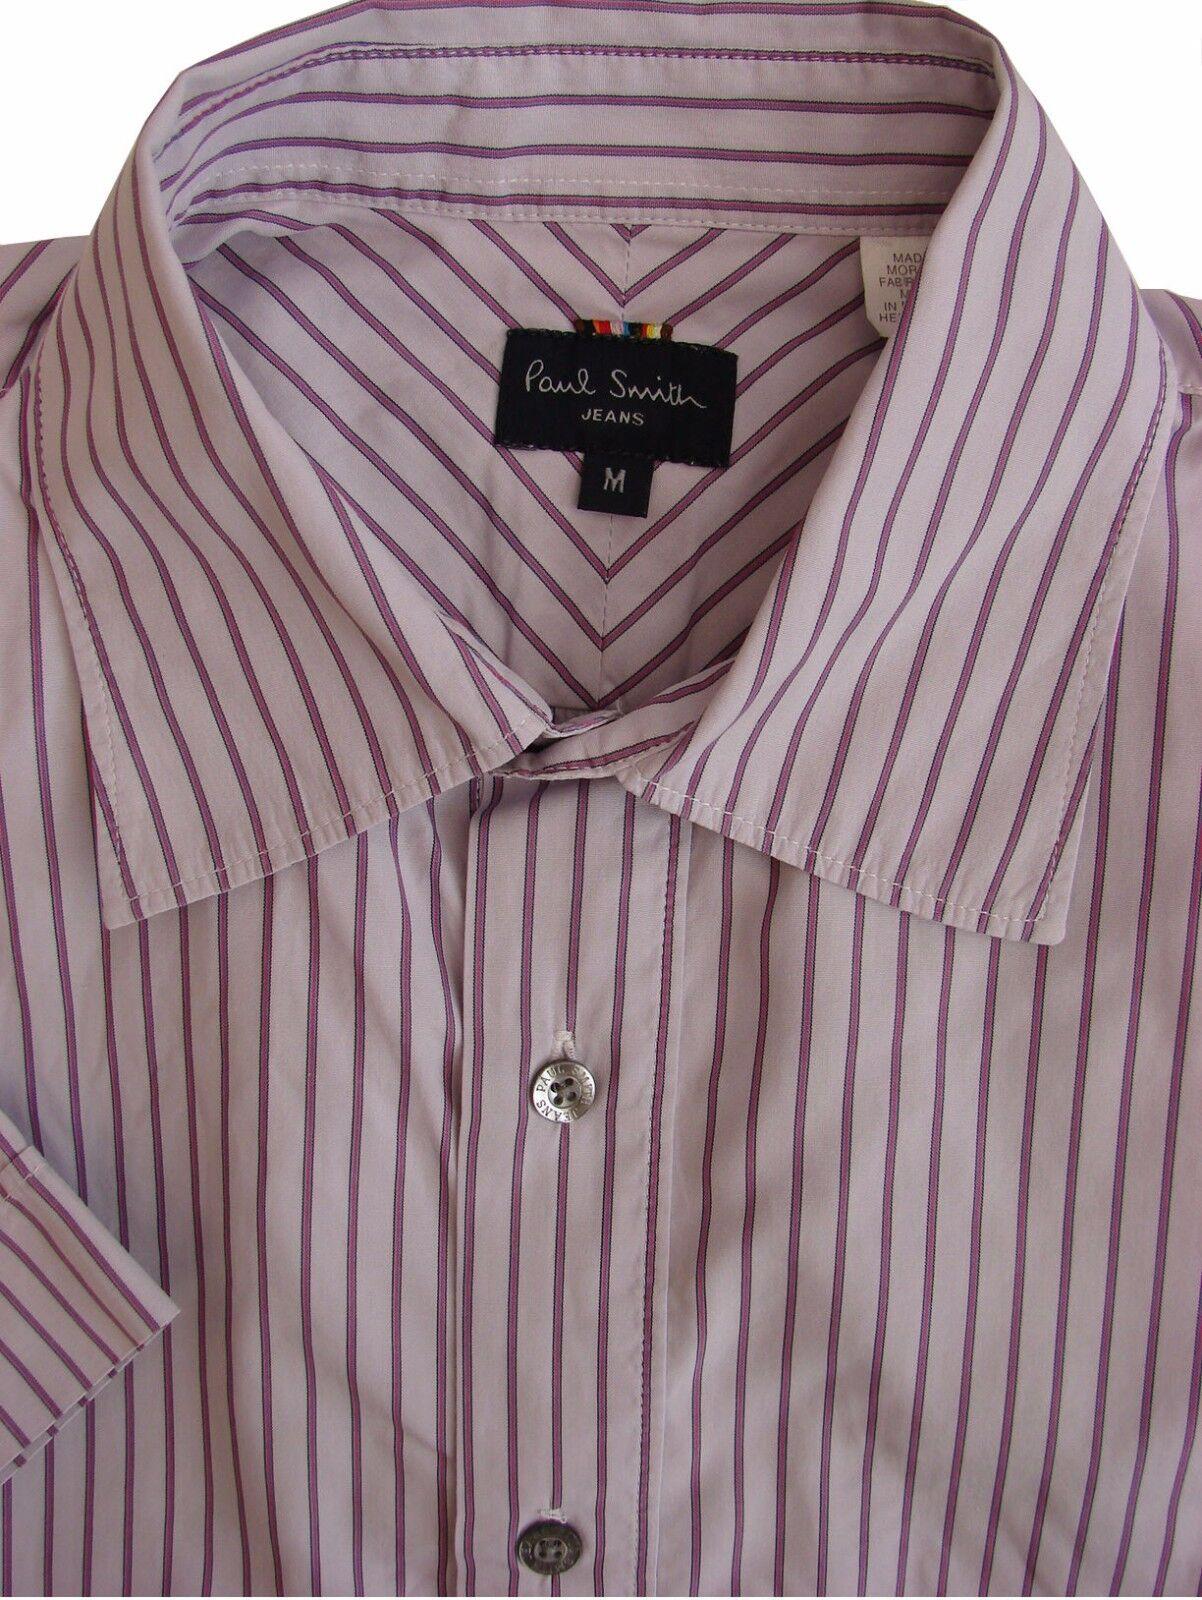 PAUL SMITH Shirt Mens 15.5 M purplec – Fuchsia Stripes SHORT SLEEVE